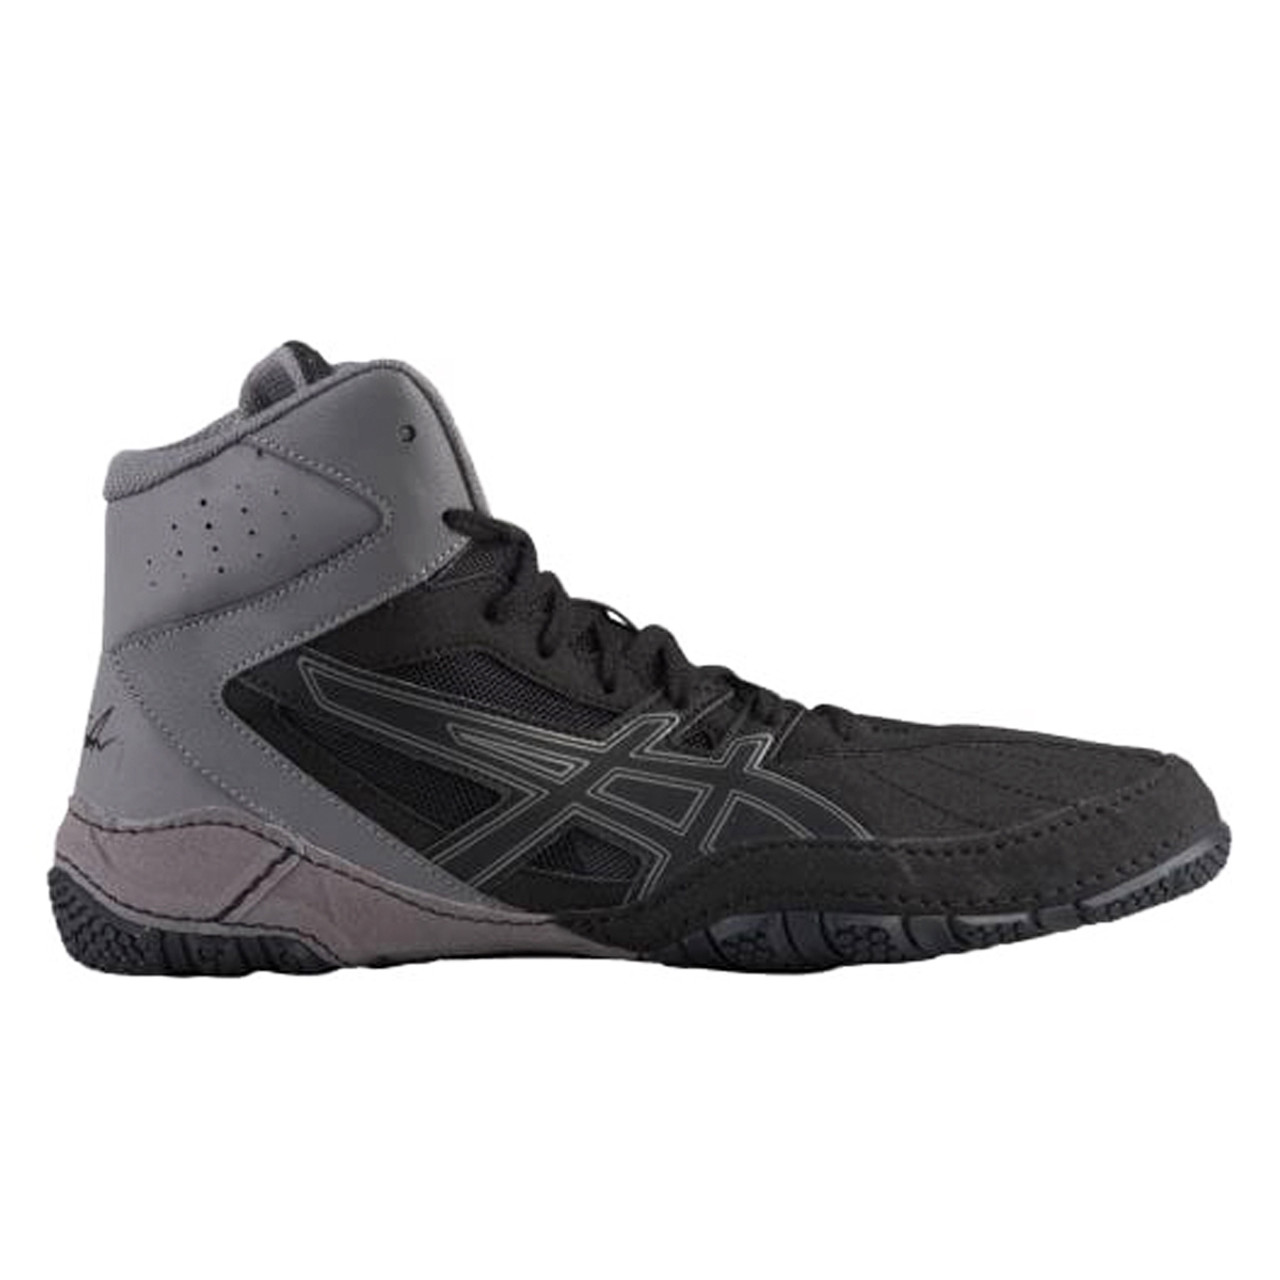 asics wrestling mat shoes original